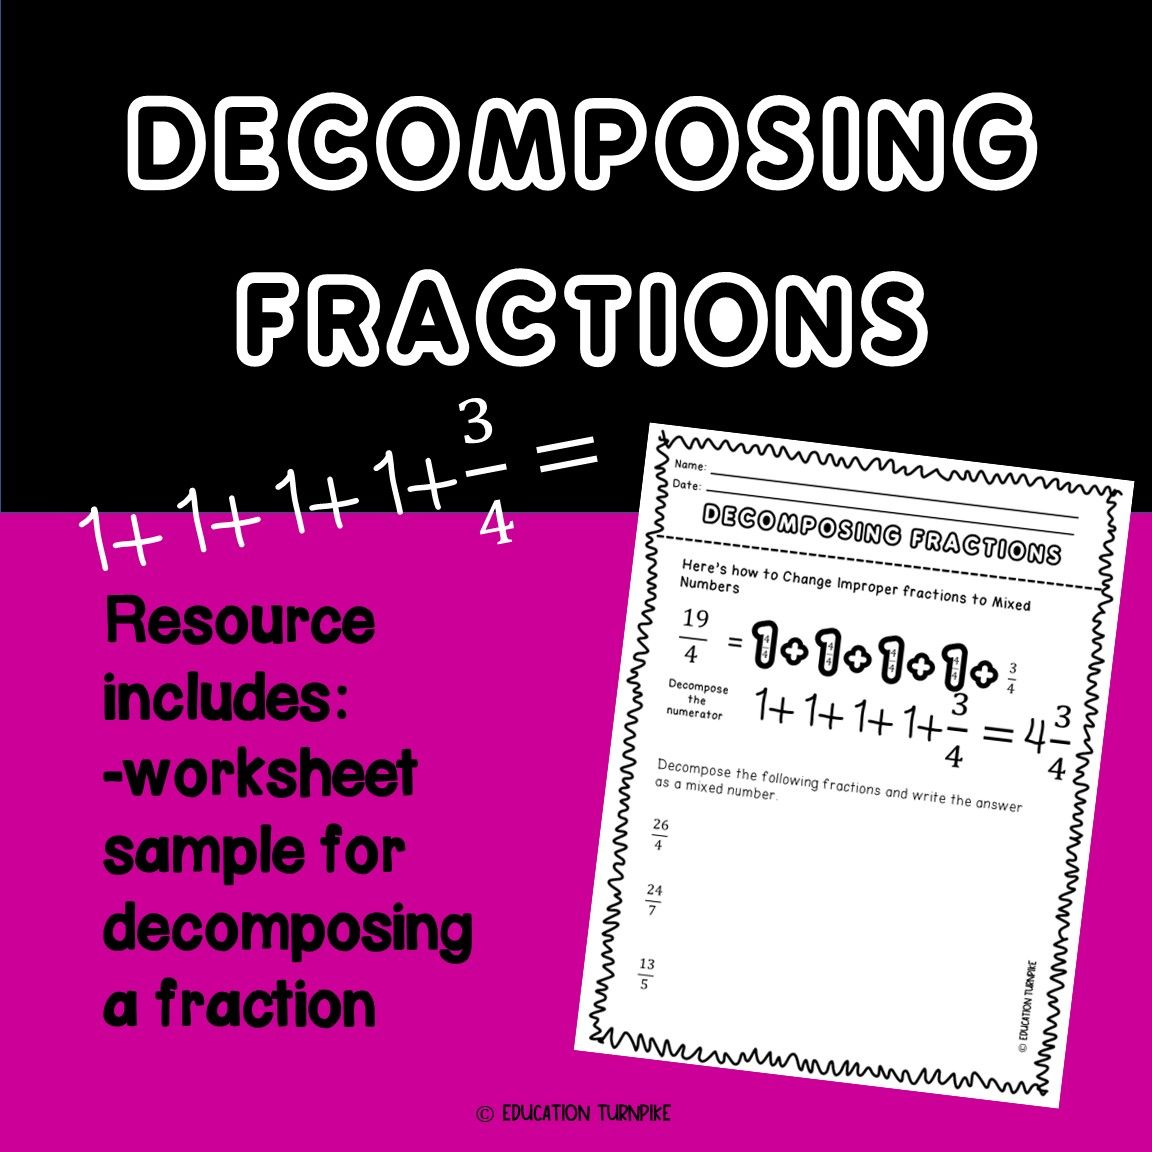 Decomposing Fractions Handout